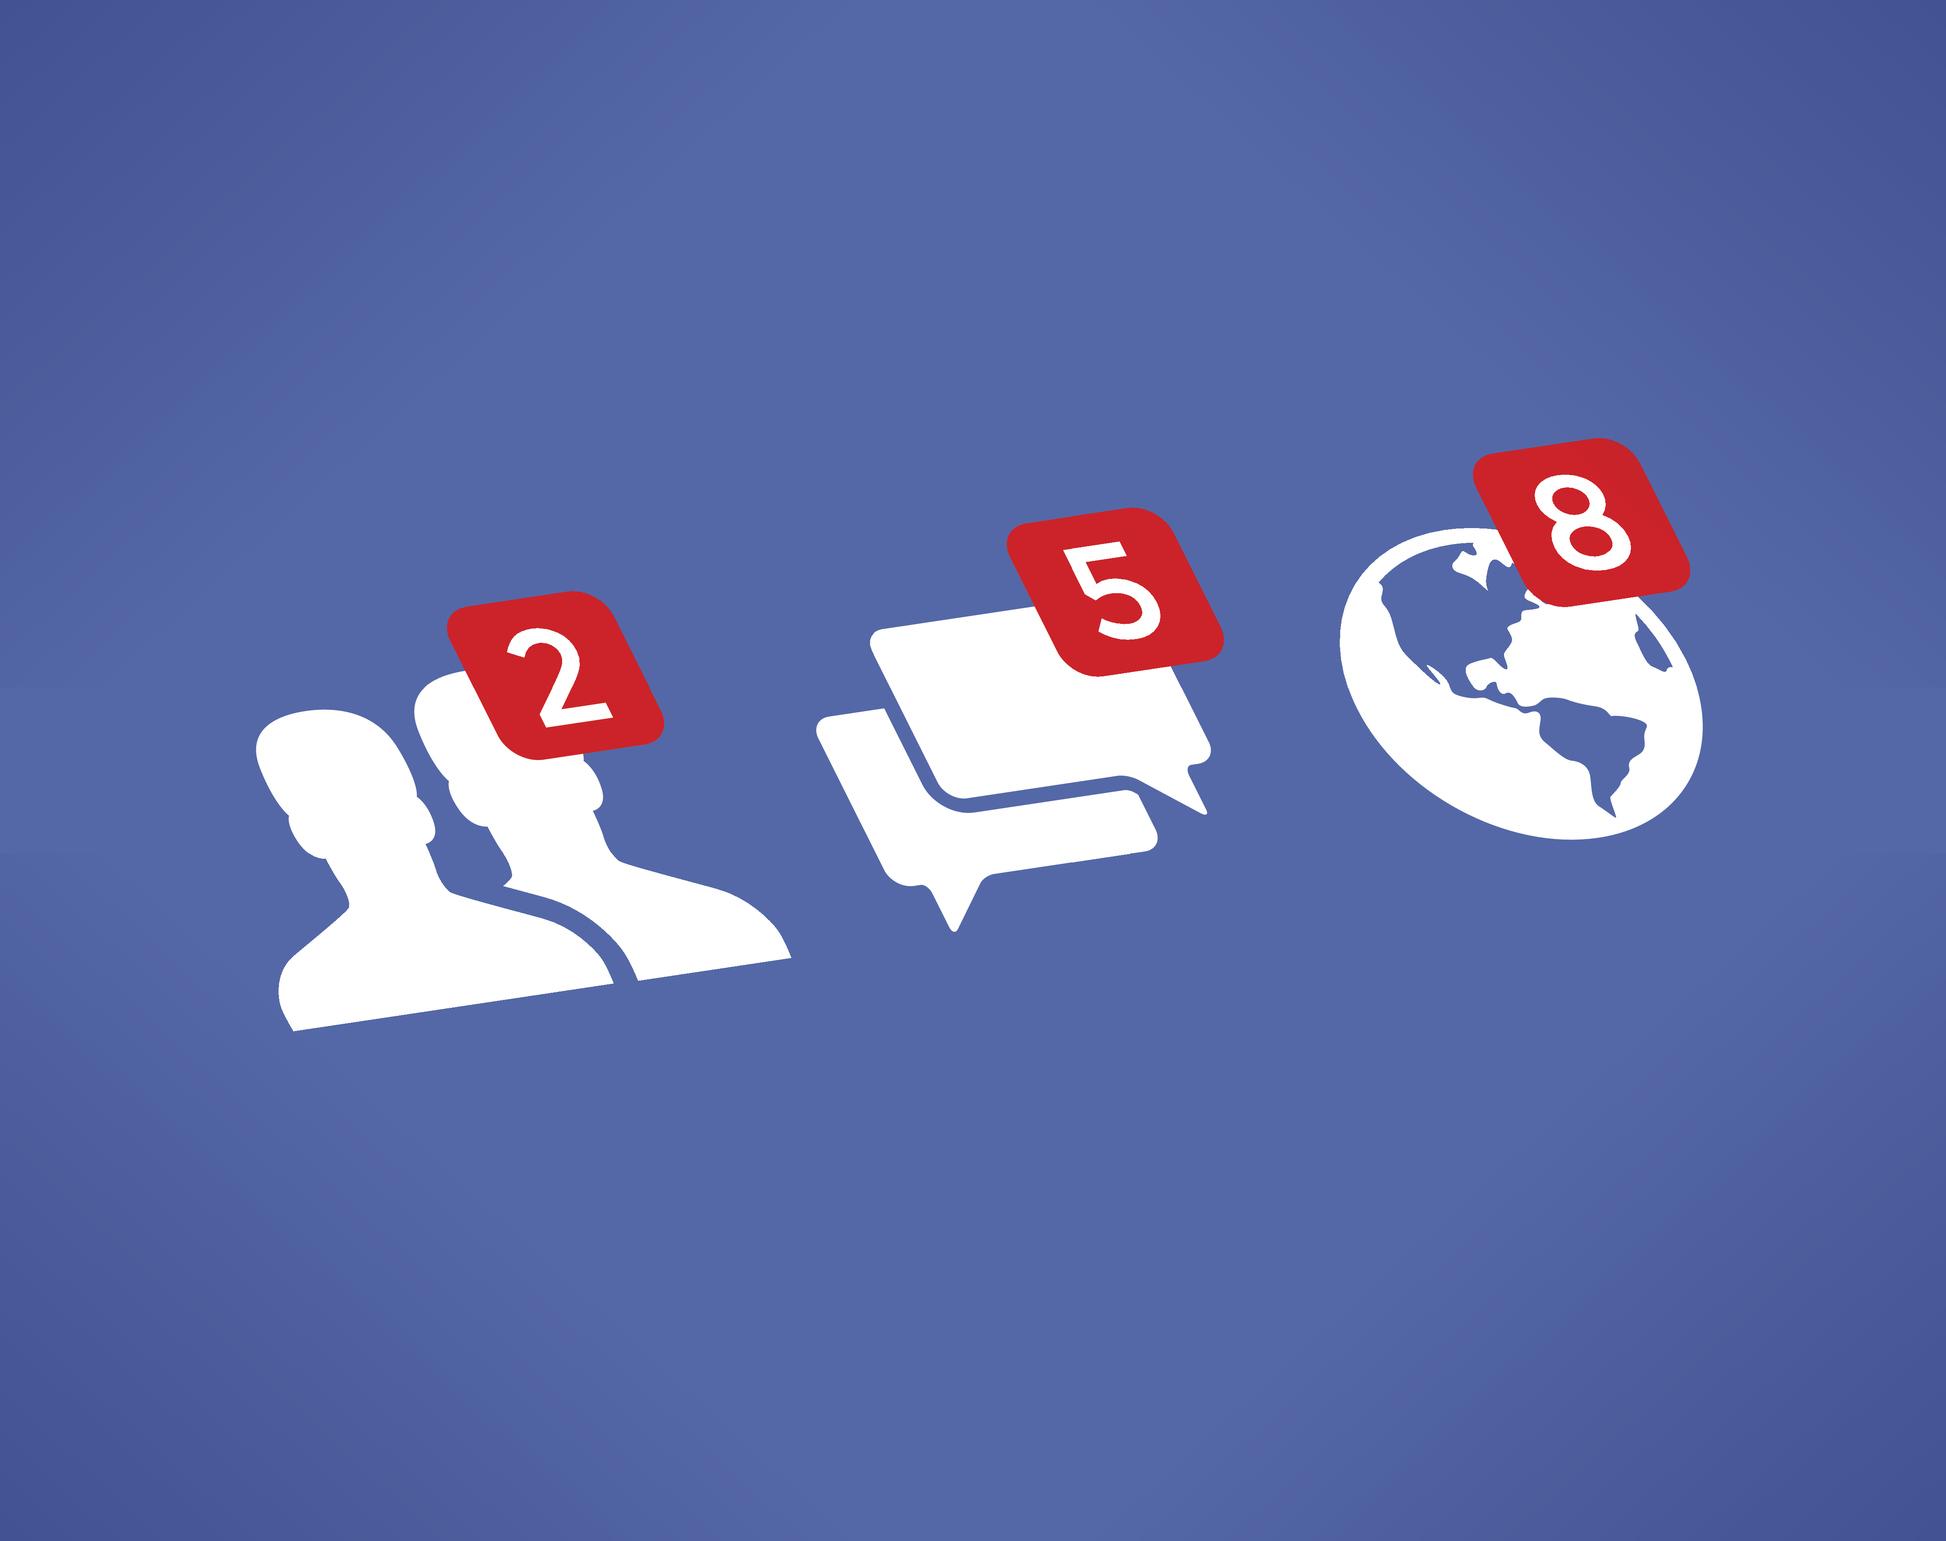 Notifications in the Facebook app